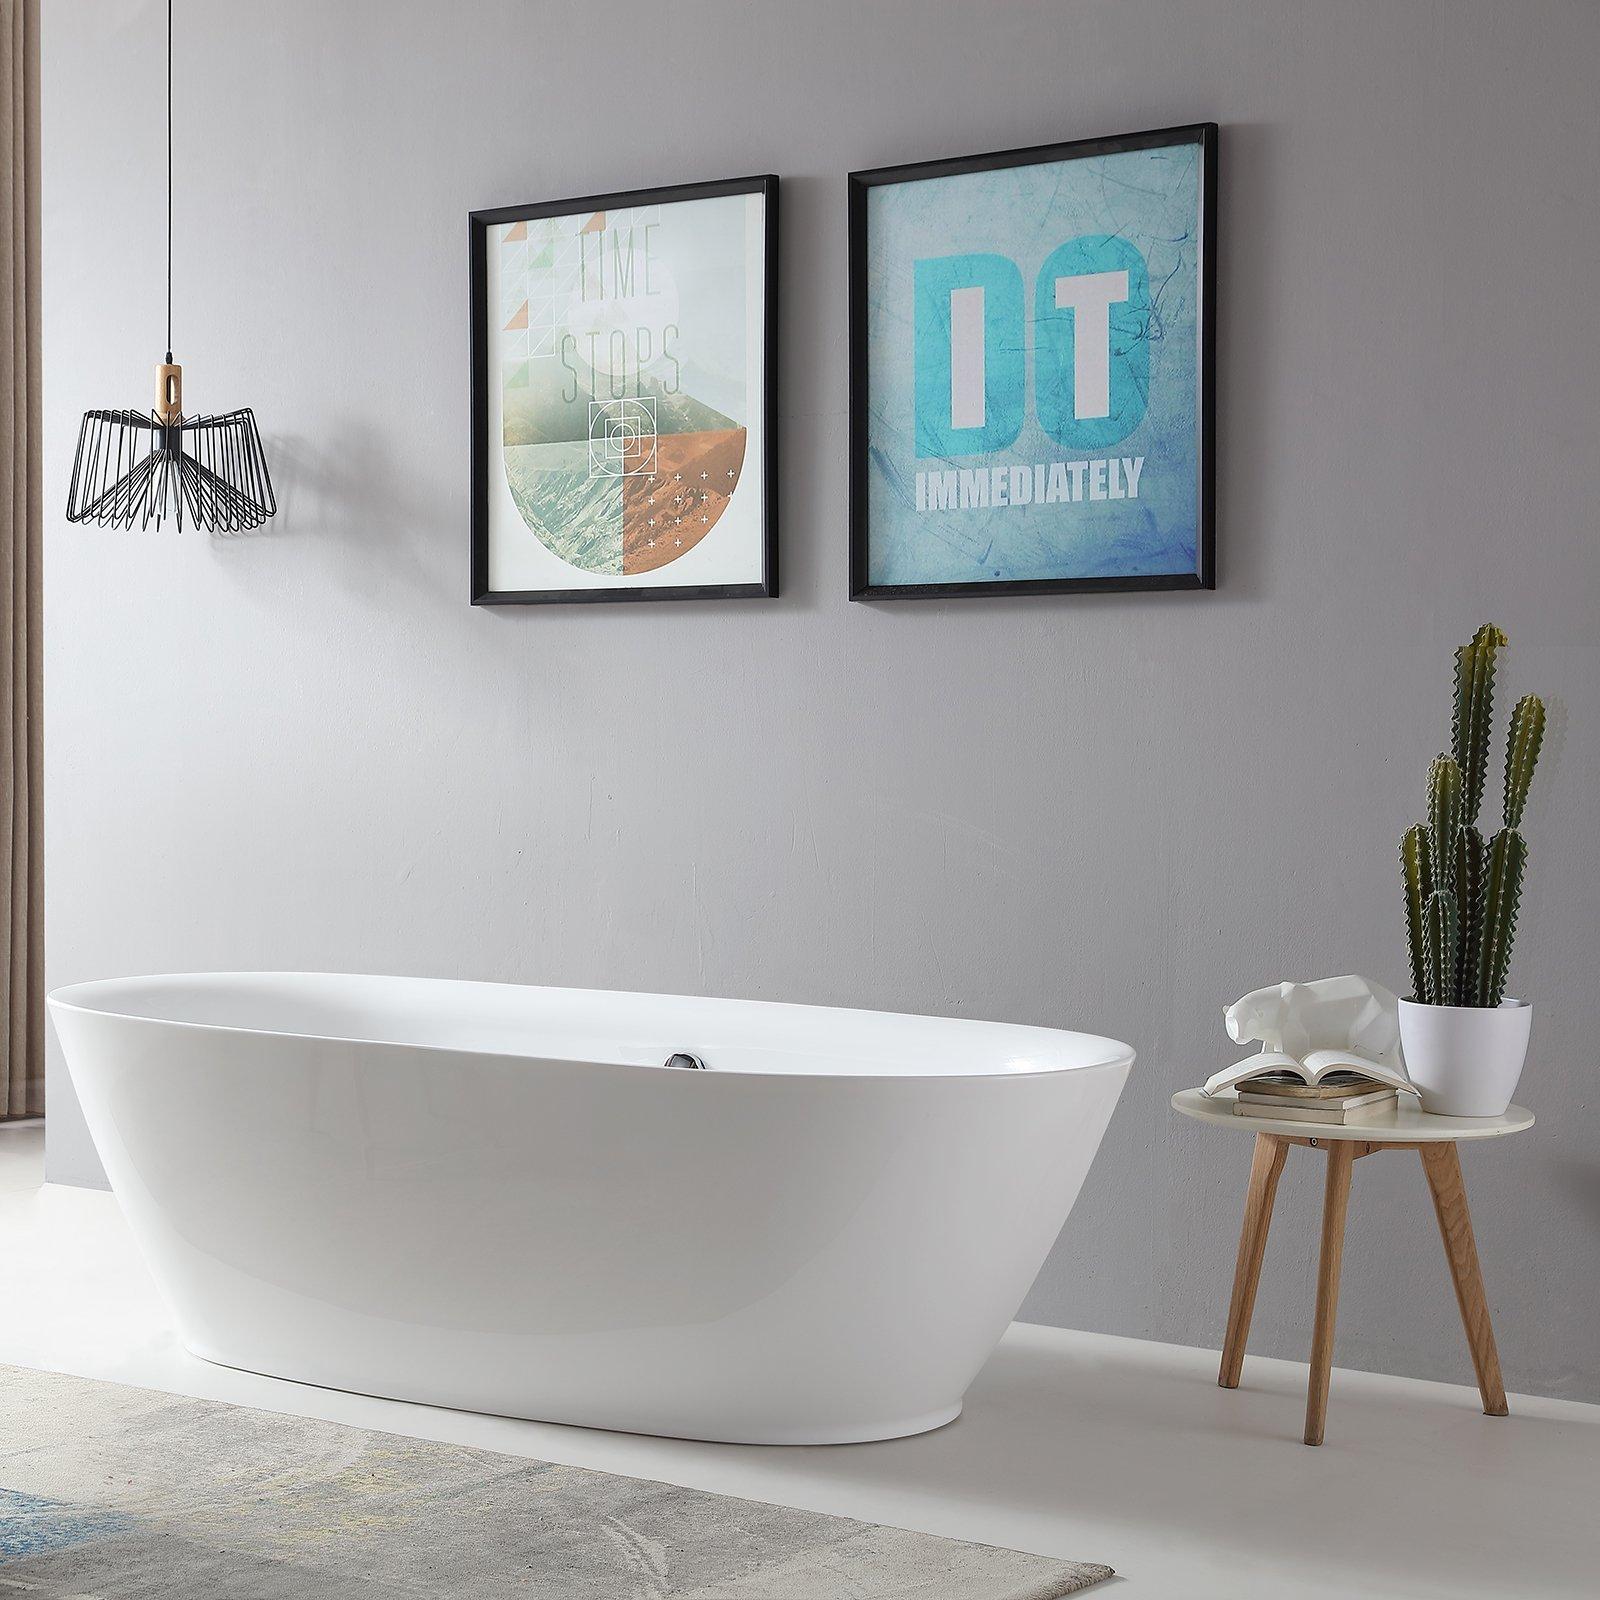 Freistehende Badewanne ROMA ACRYL weiß BS-916 180x84 inkl. Armatur 8028